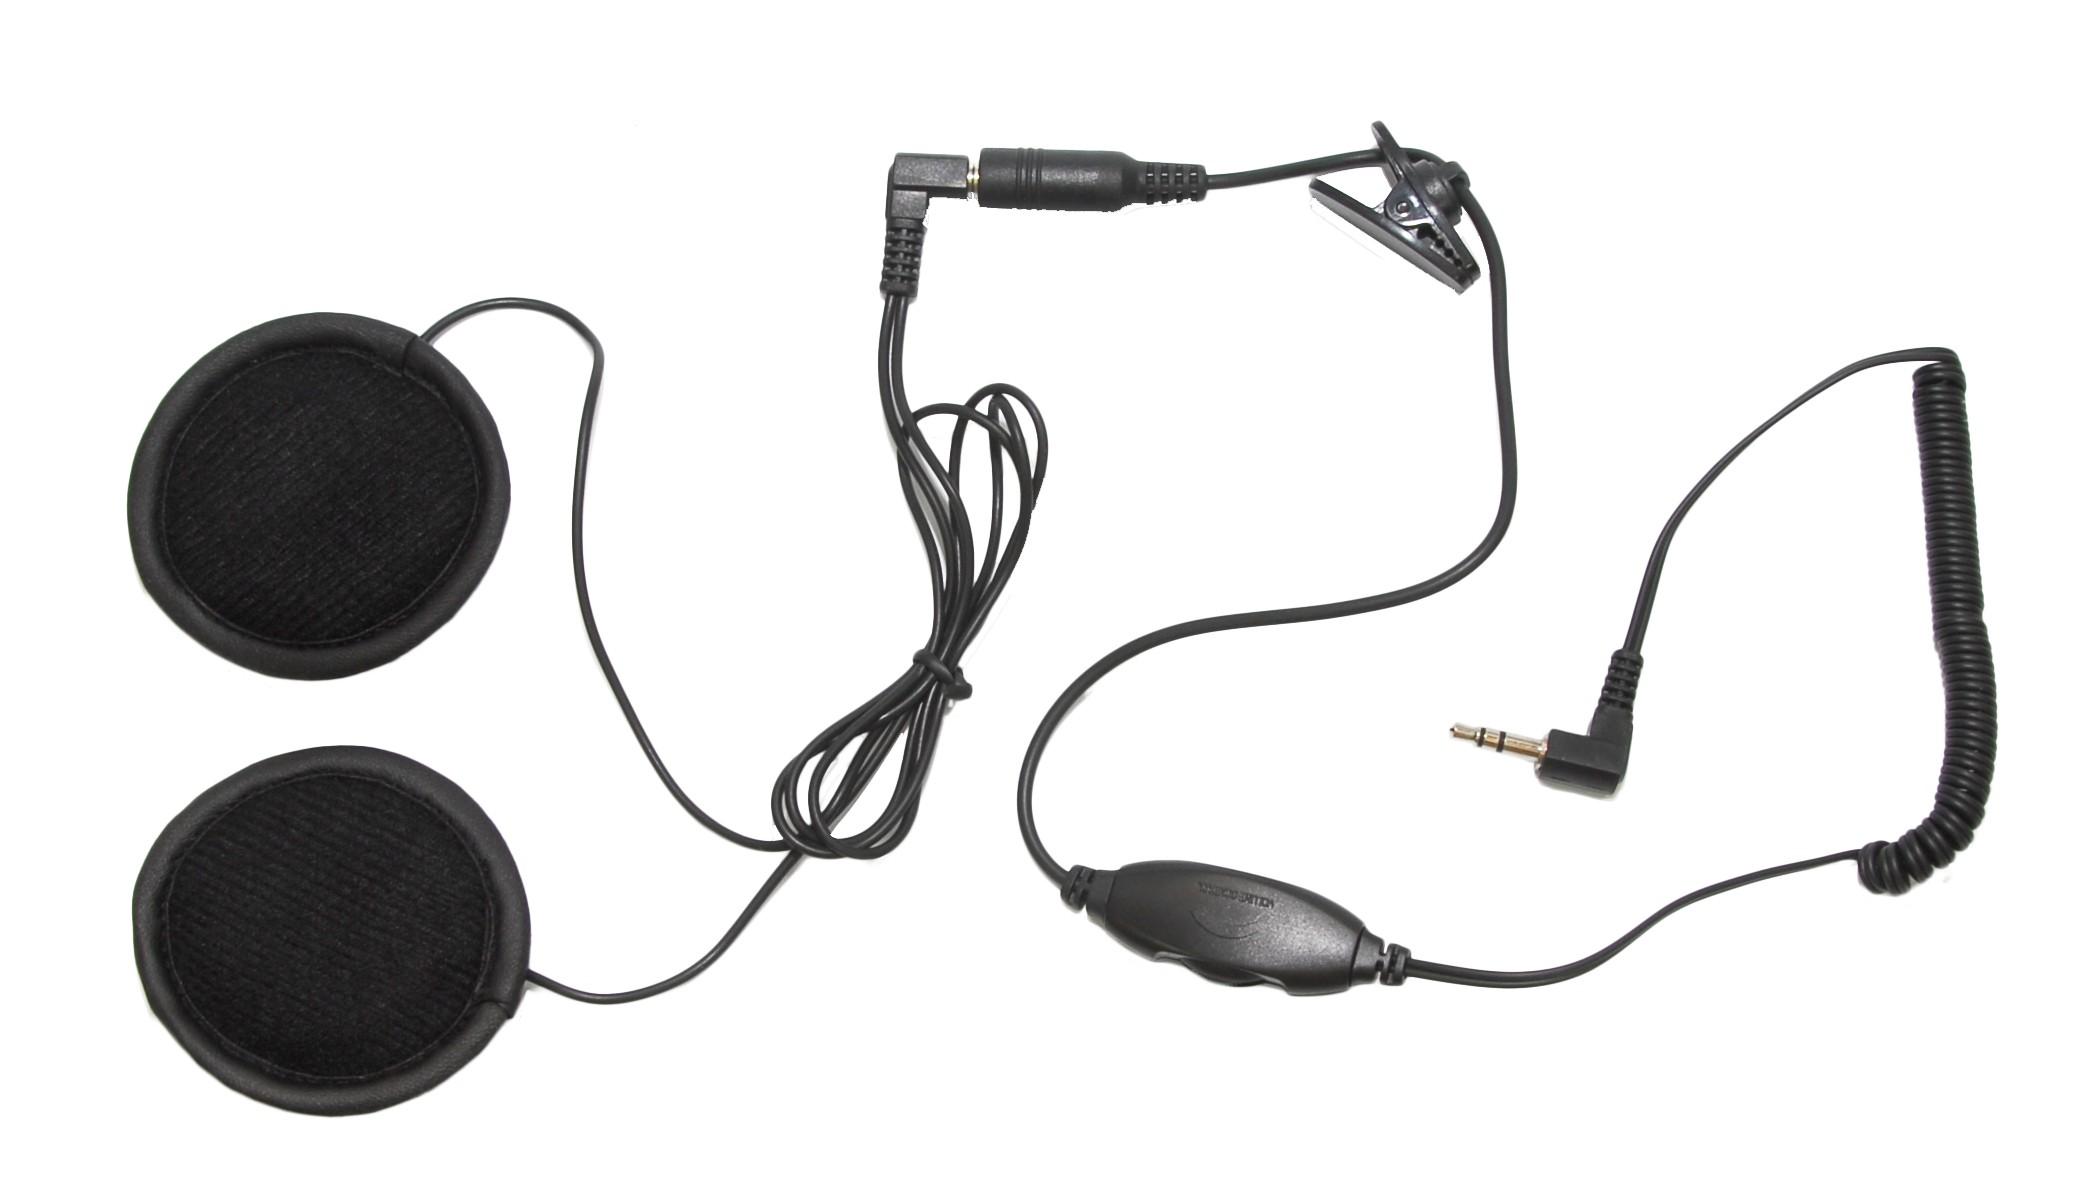 tork x pro motorcycle helmet speakers with volume control